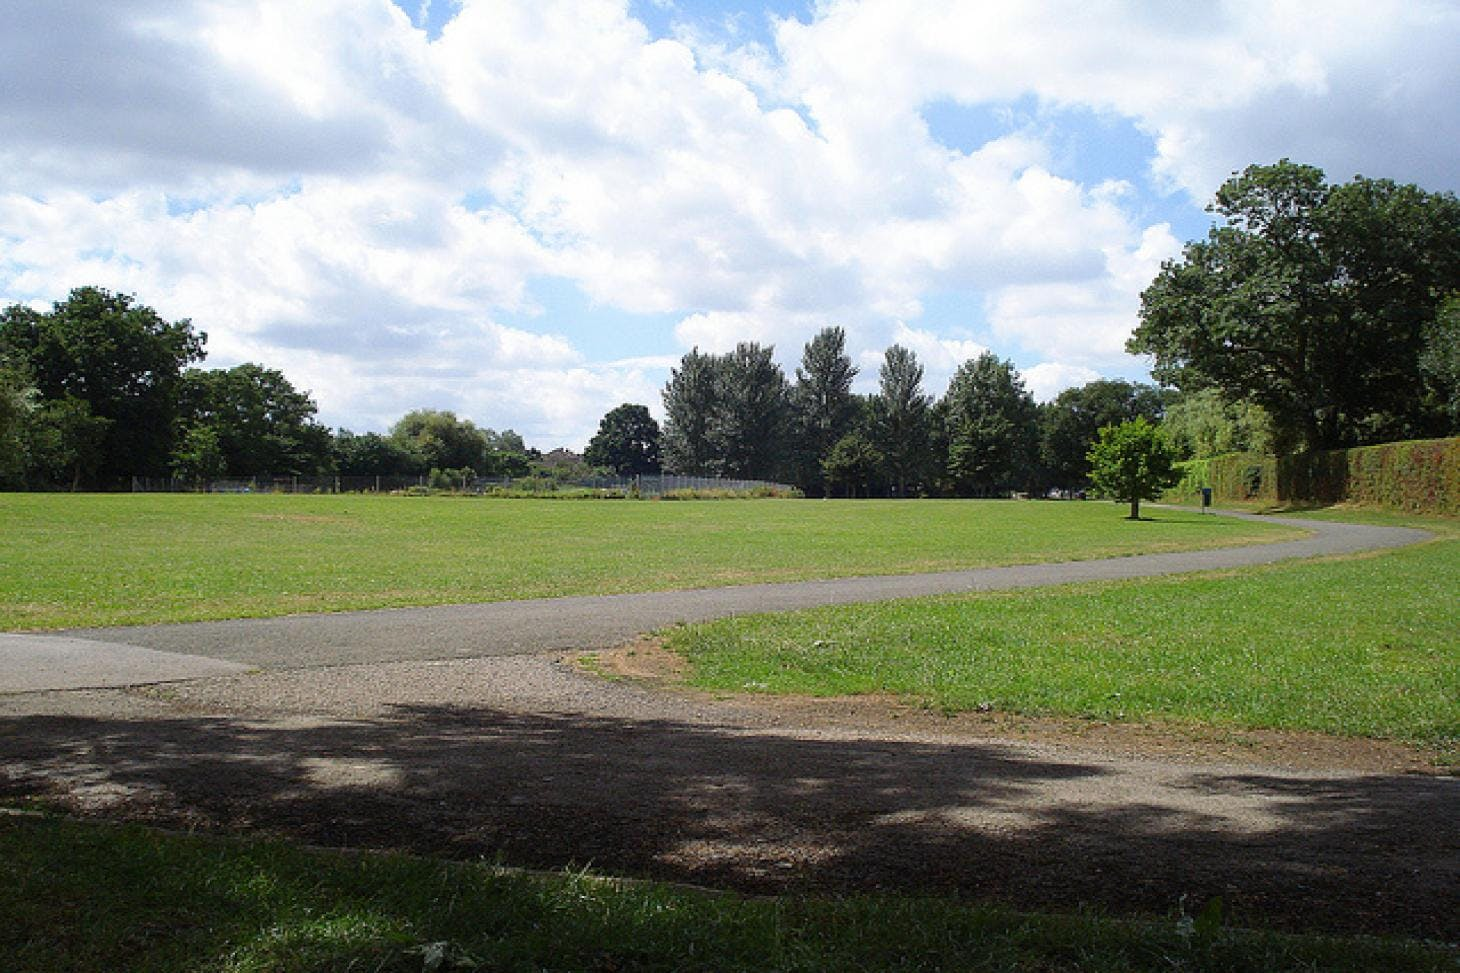 Kenton Recreation Ground 5 a side | Grass football pitch